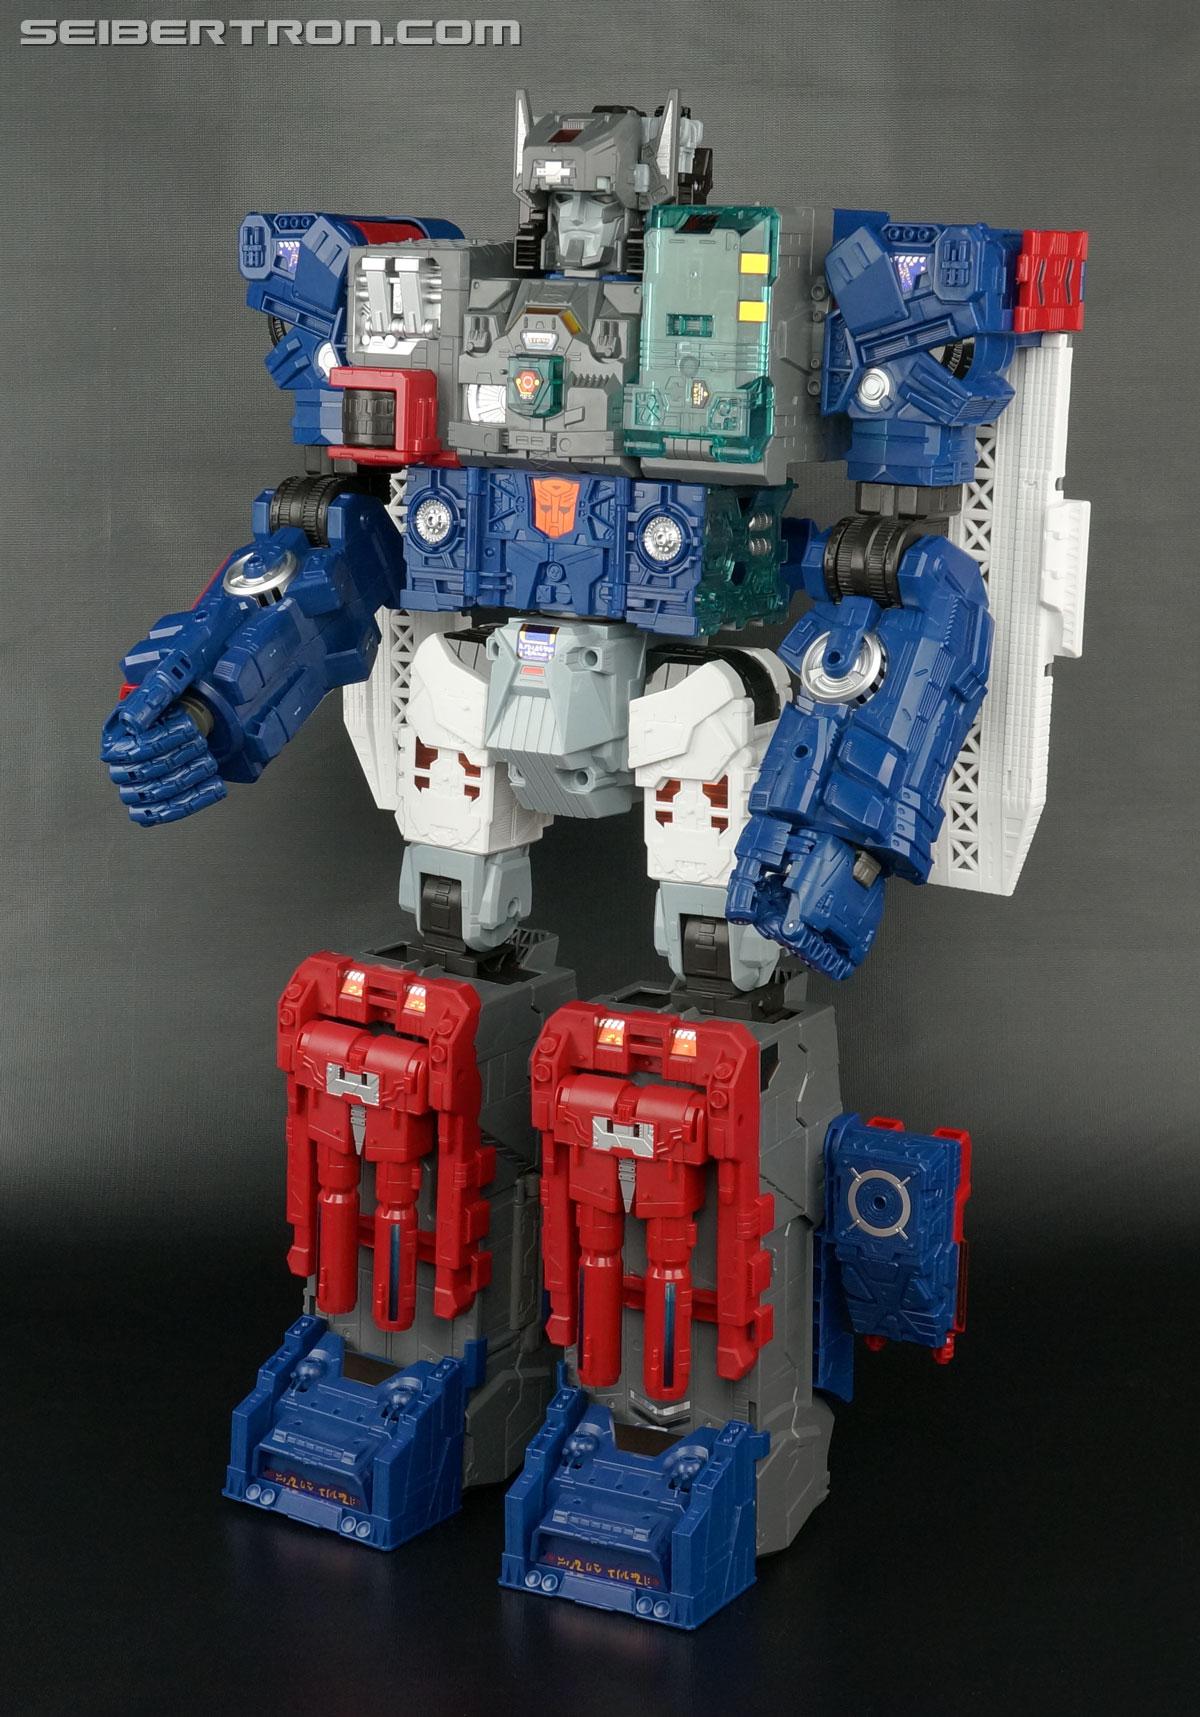 Transformers Titans Return Fortress Maximus (Image #262 of 399)